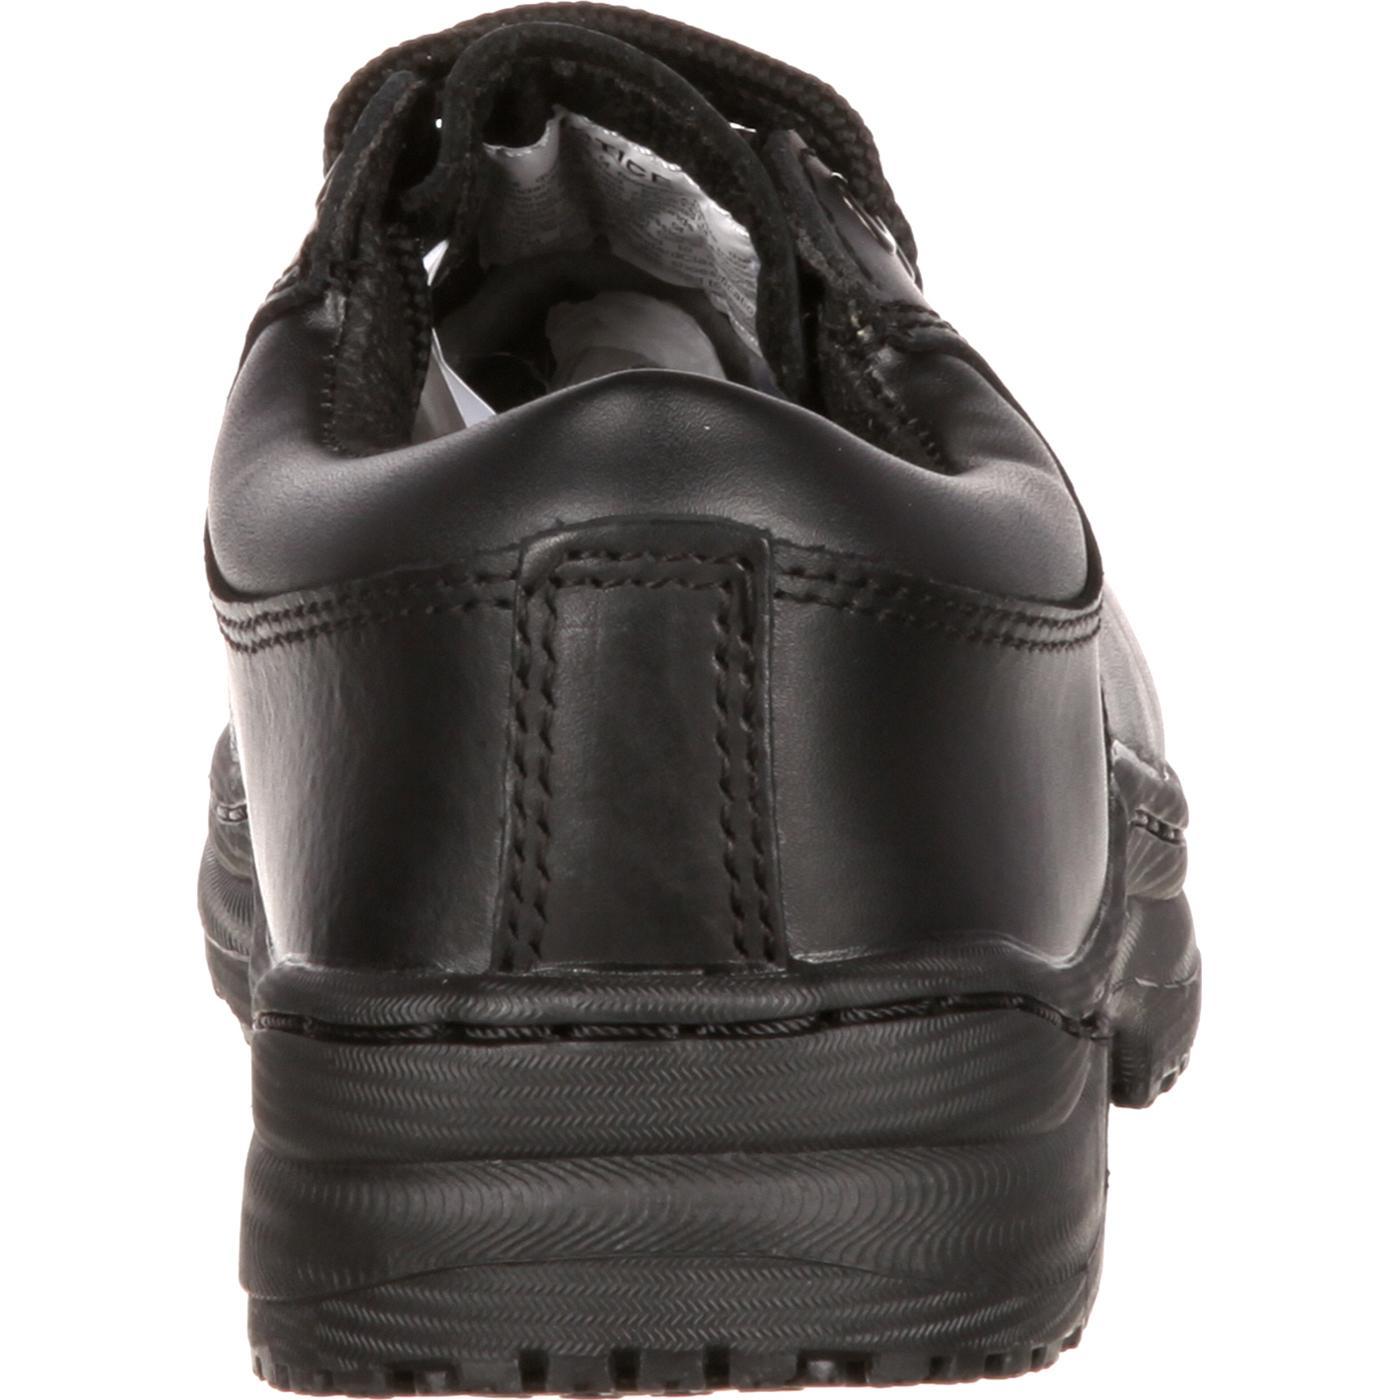 women s comfortable amazon comforter patricia shoes dp resistant slip com shoe womens in step cherokee